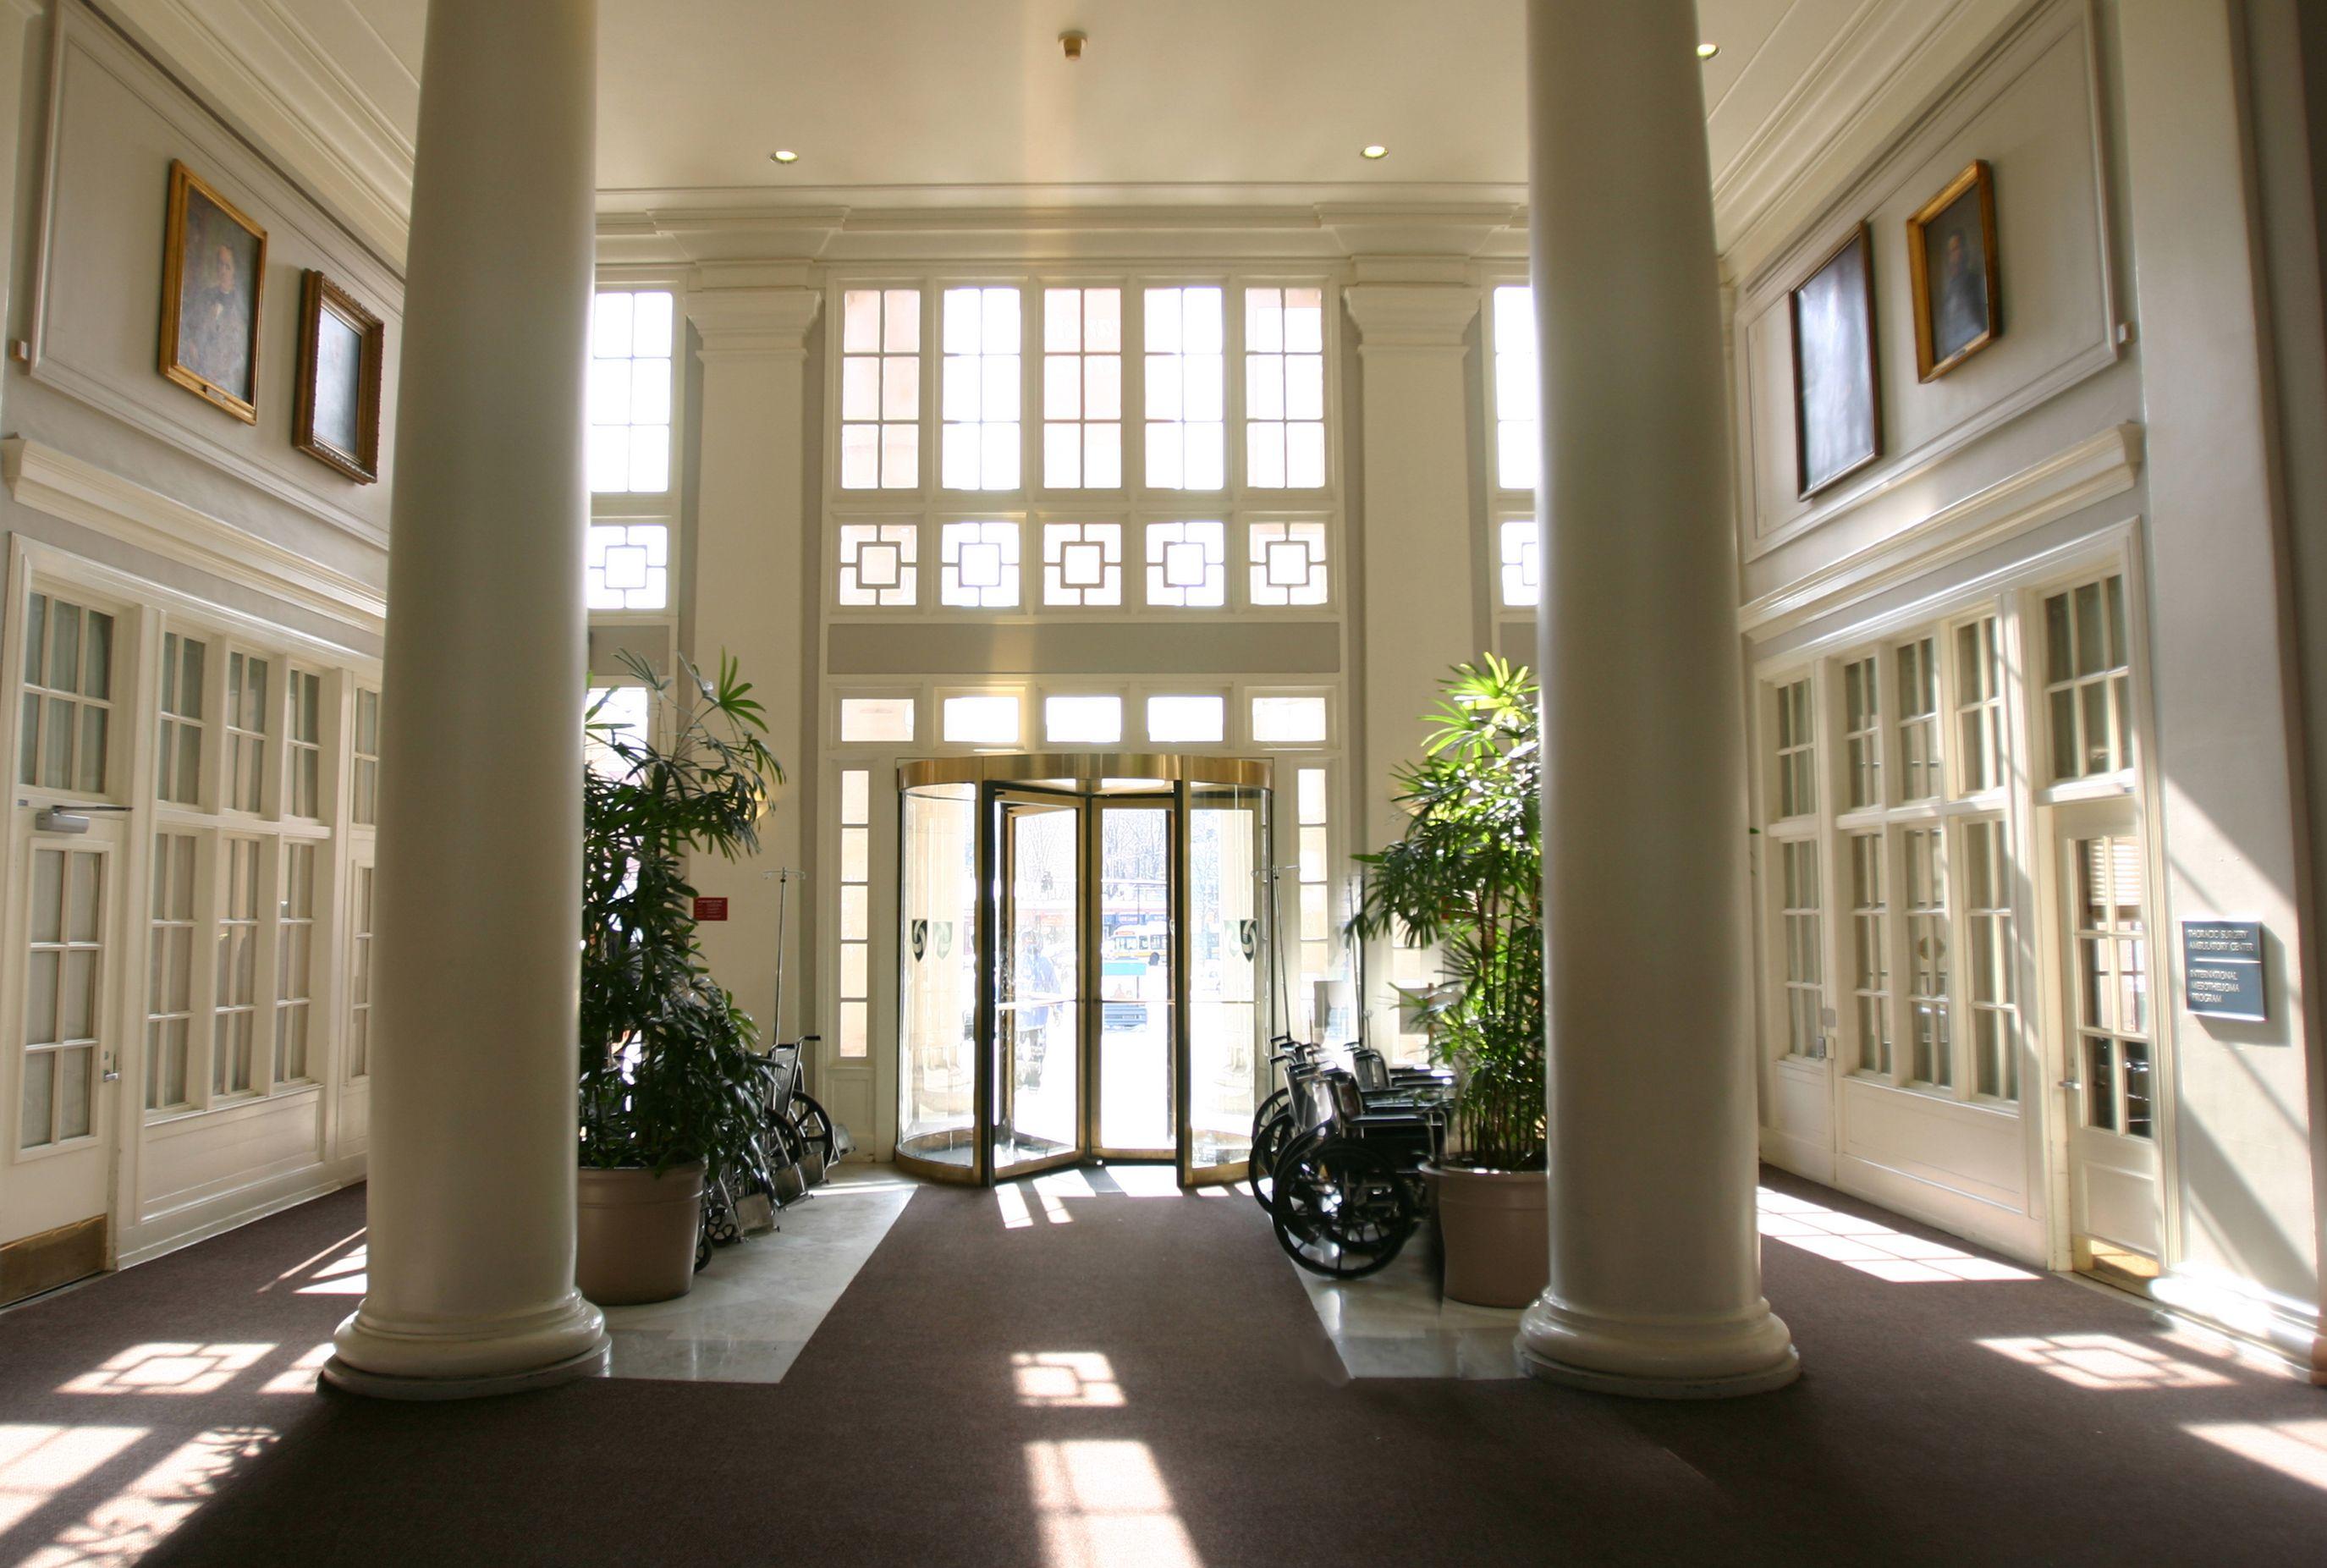 Boston hospital medical center boston hospitals